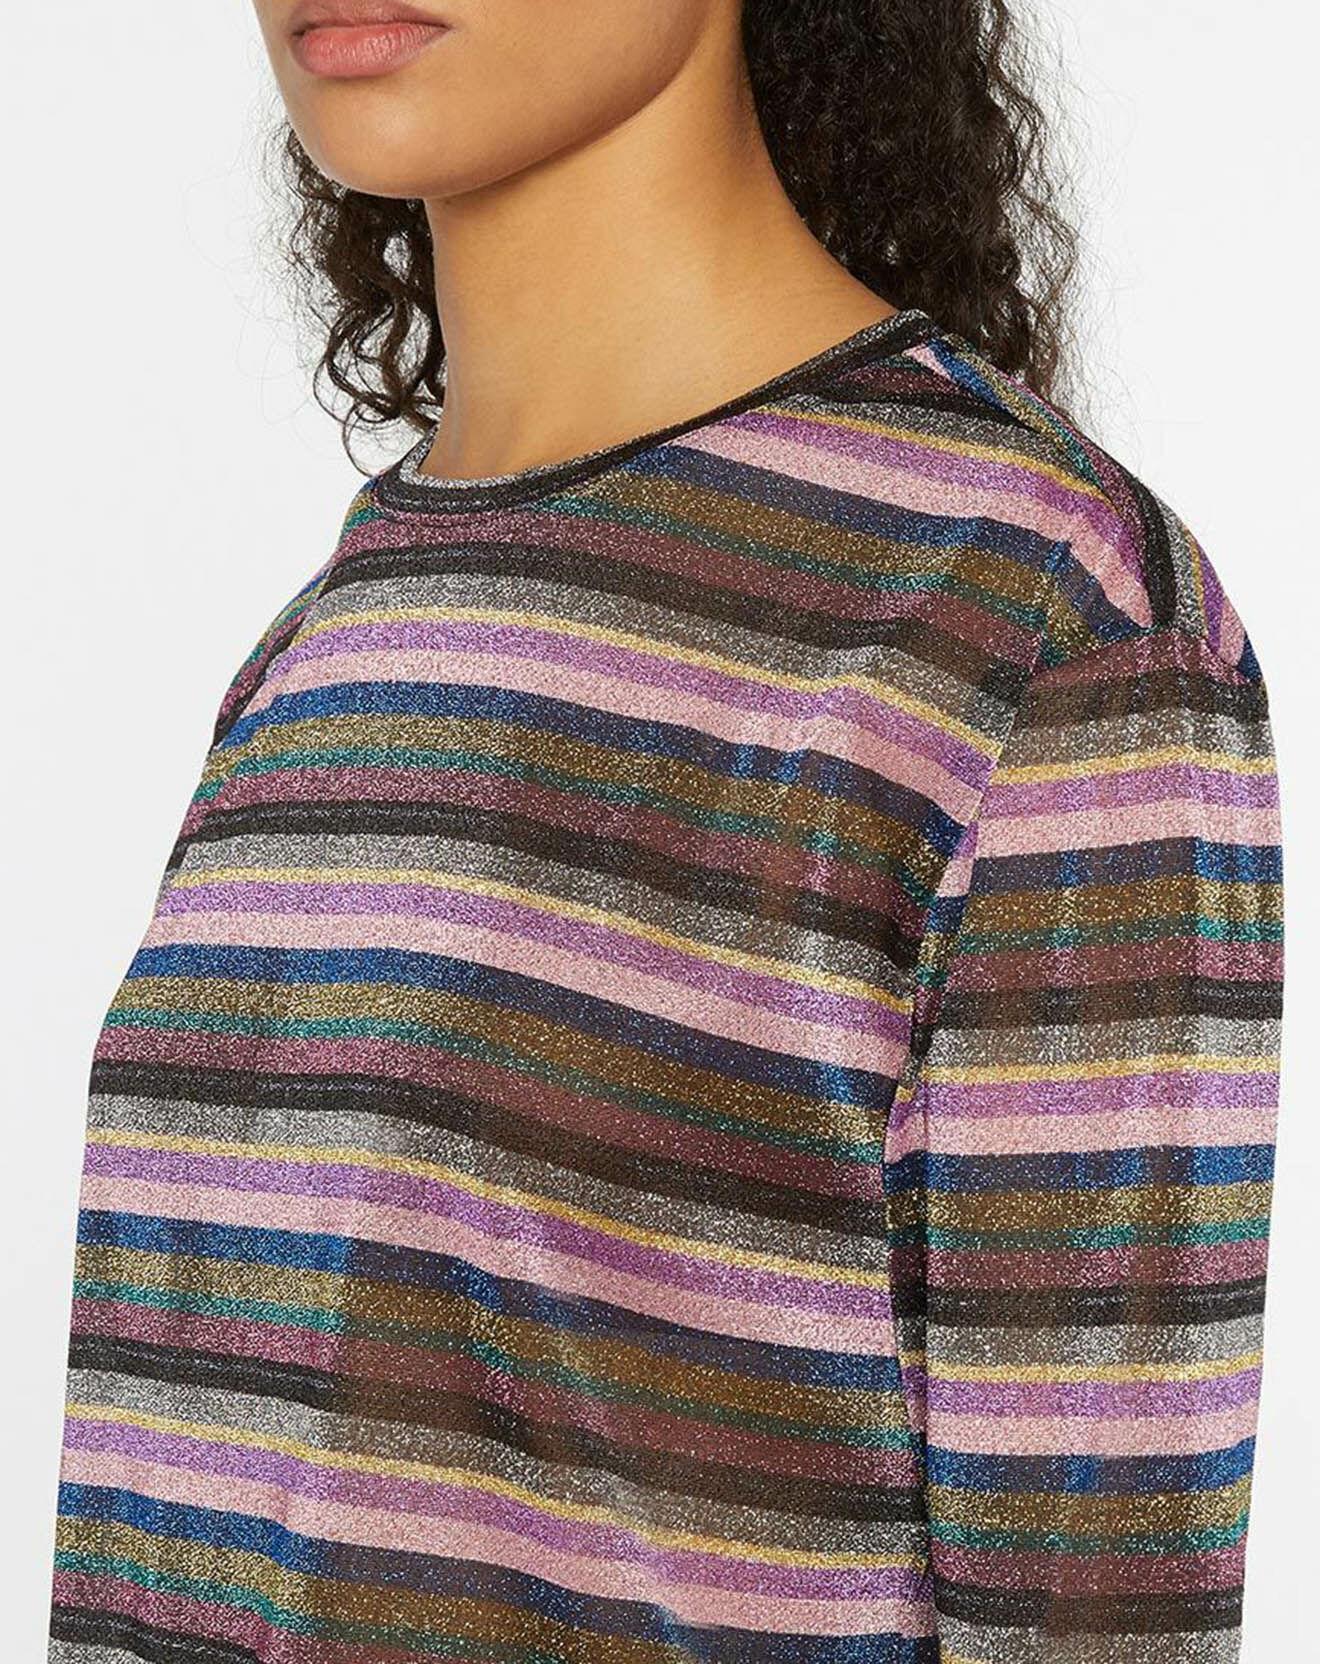 T-Shirt rayé Lurex multicolore - Pepe Jeans - Modalova